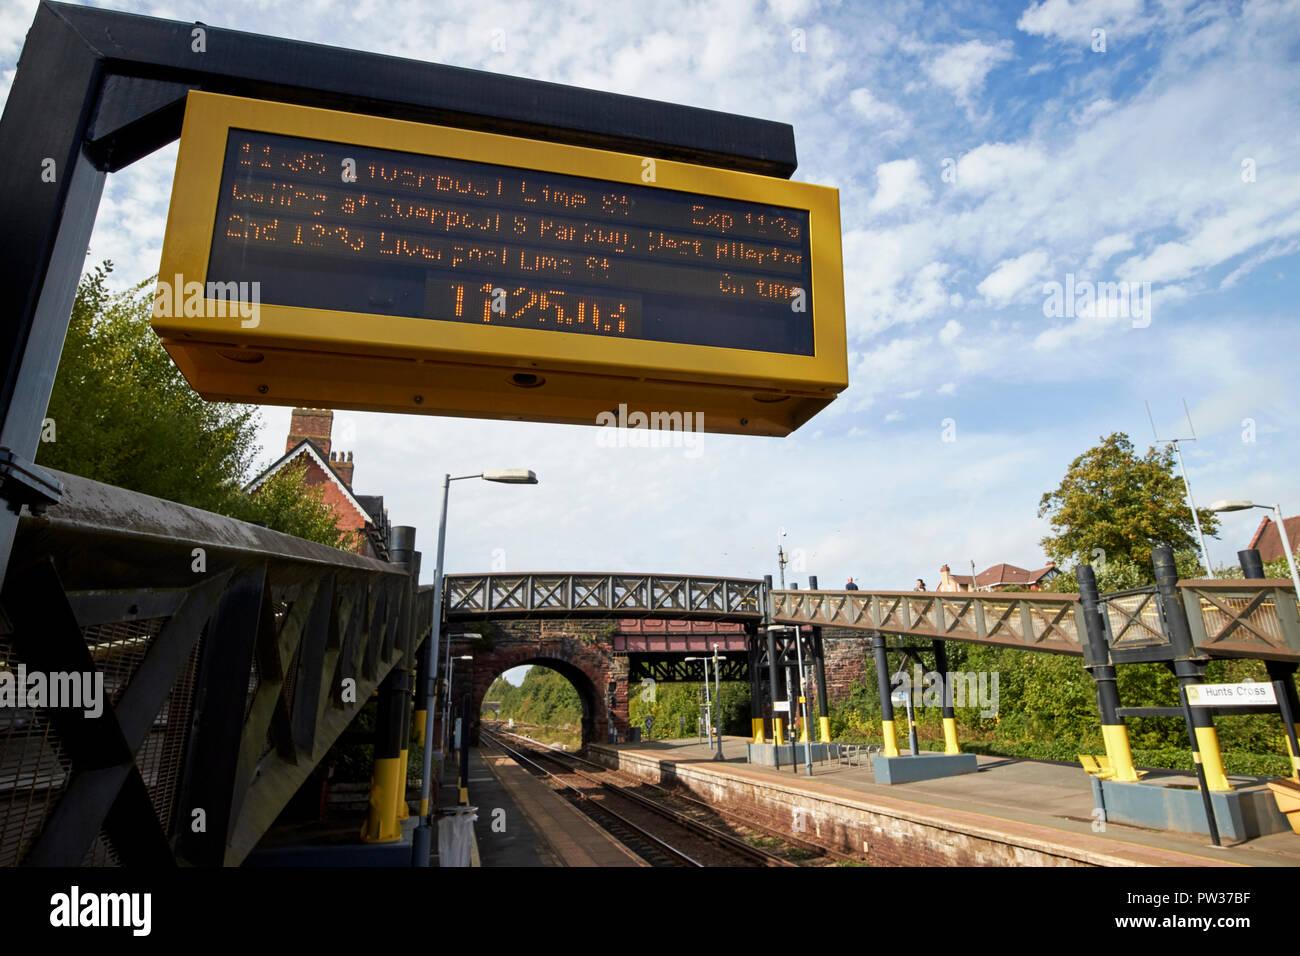 train information electronic board at hunts cross train railway station Liverpool Merseyside England UK - Stock Image